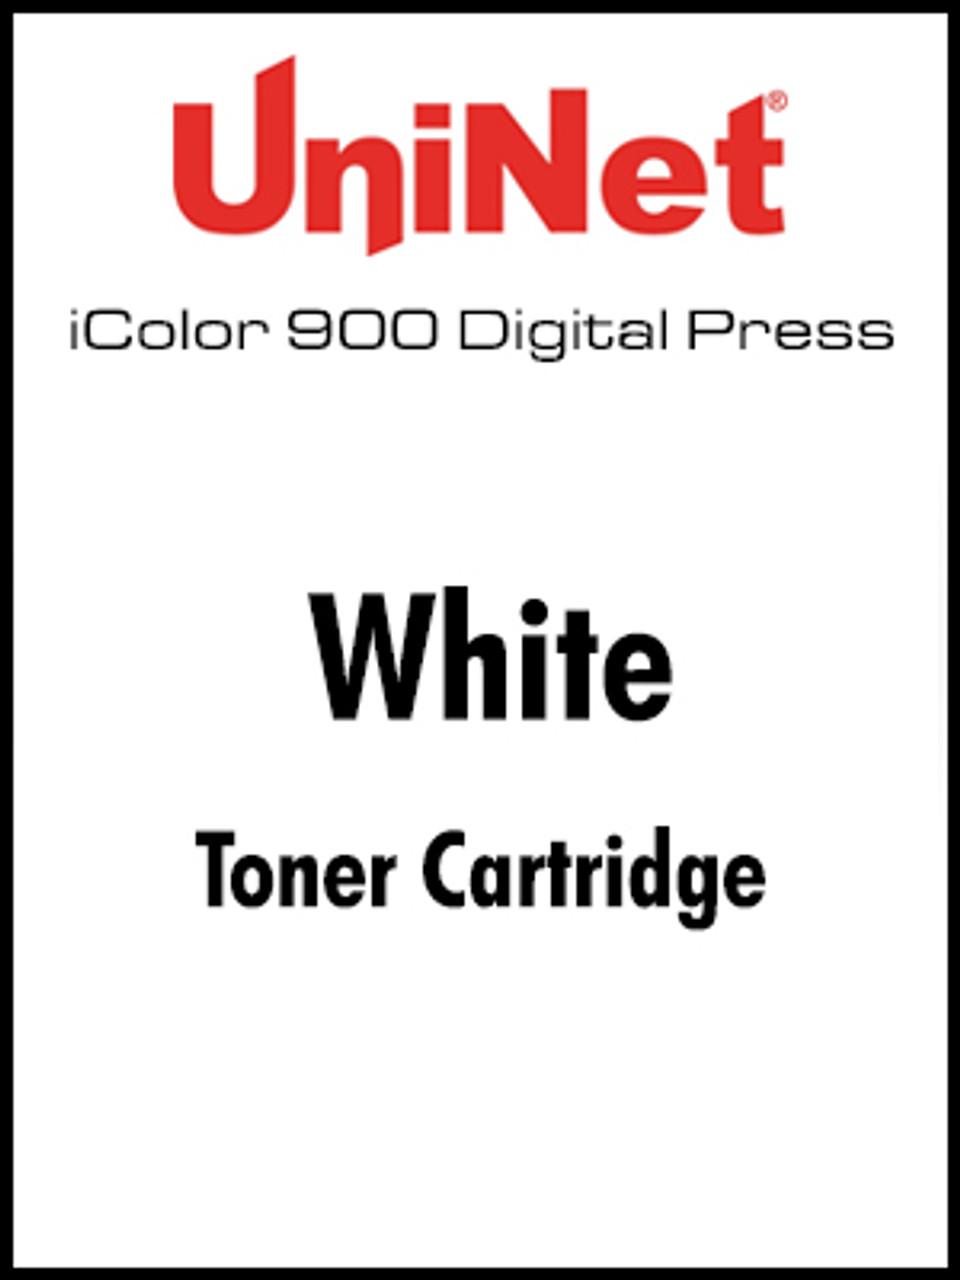 iColor 900 Digital Press White toner cartridge